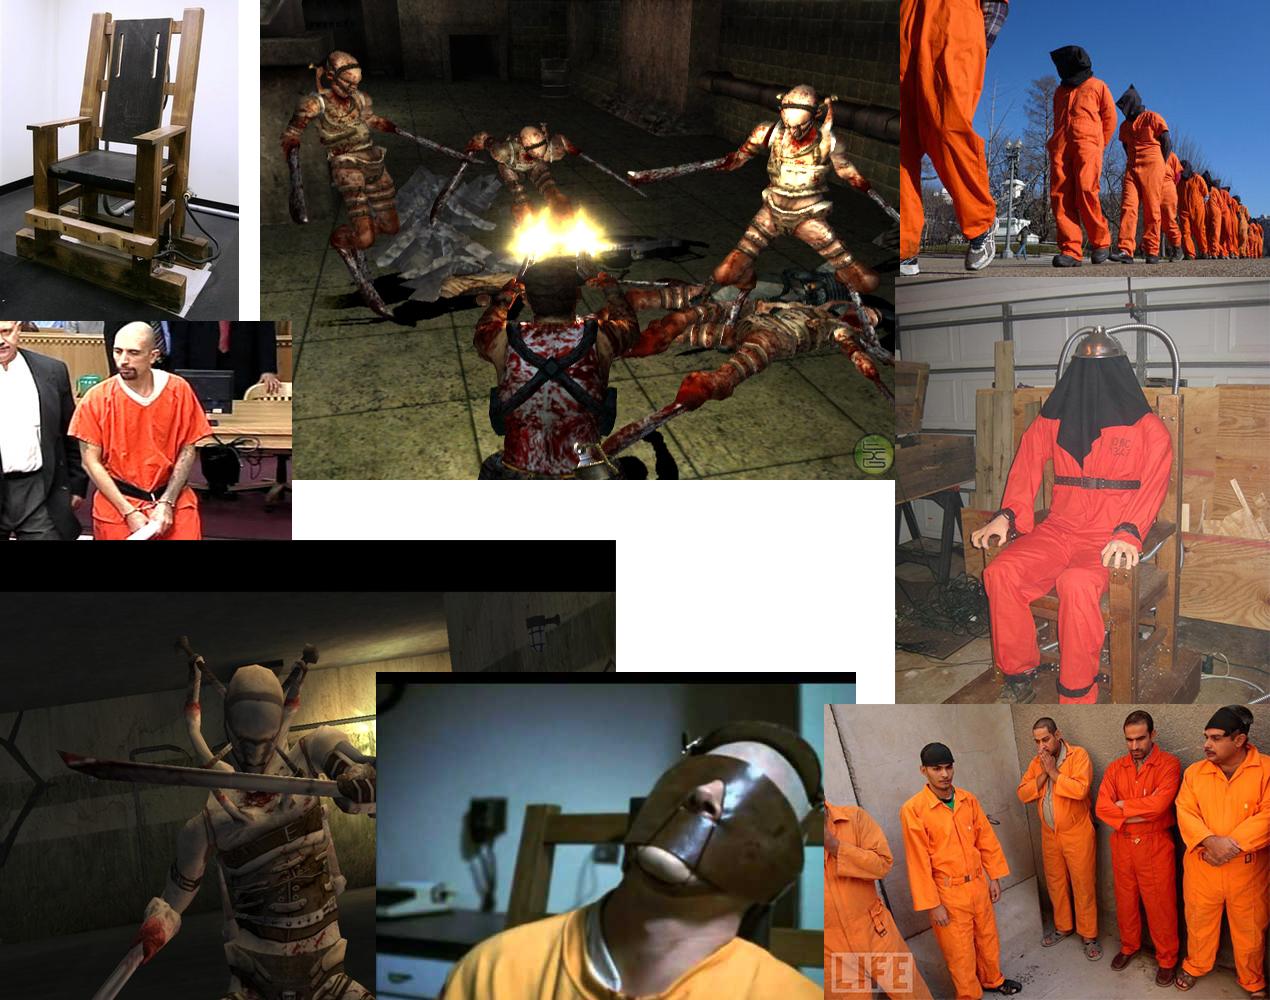 Mood pictures the prison punishment show